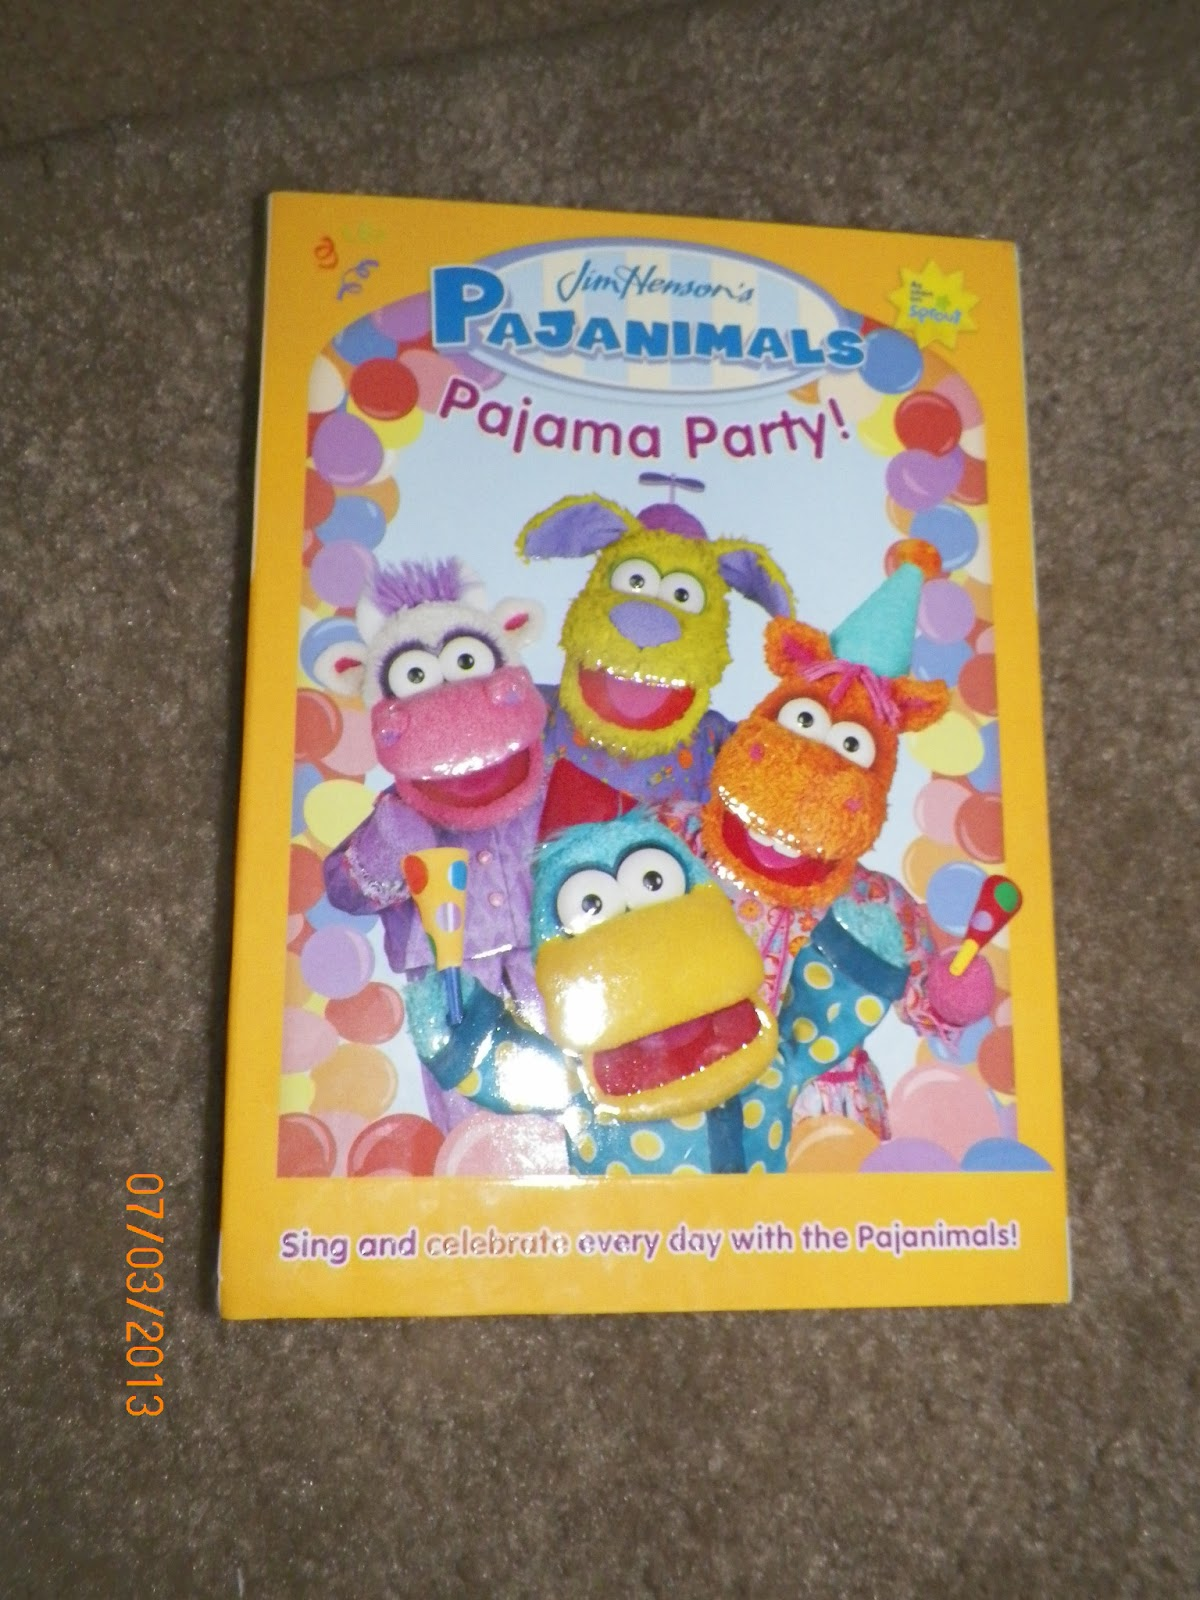 b9f262849e mygreatfinds  Pajanimals  Pajama Party! DVD Review